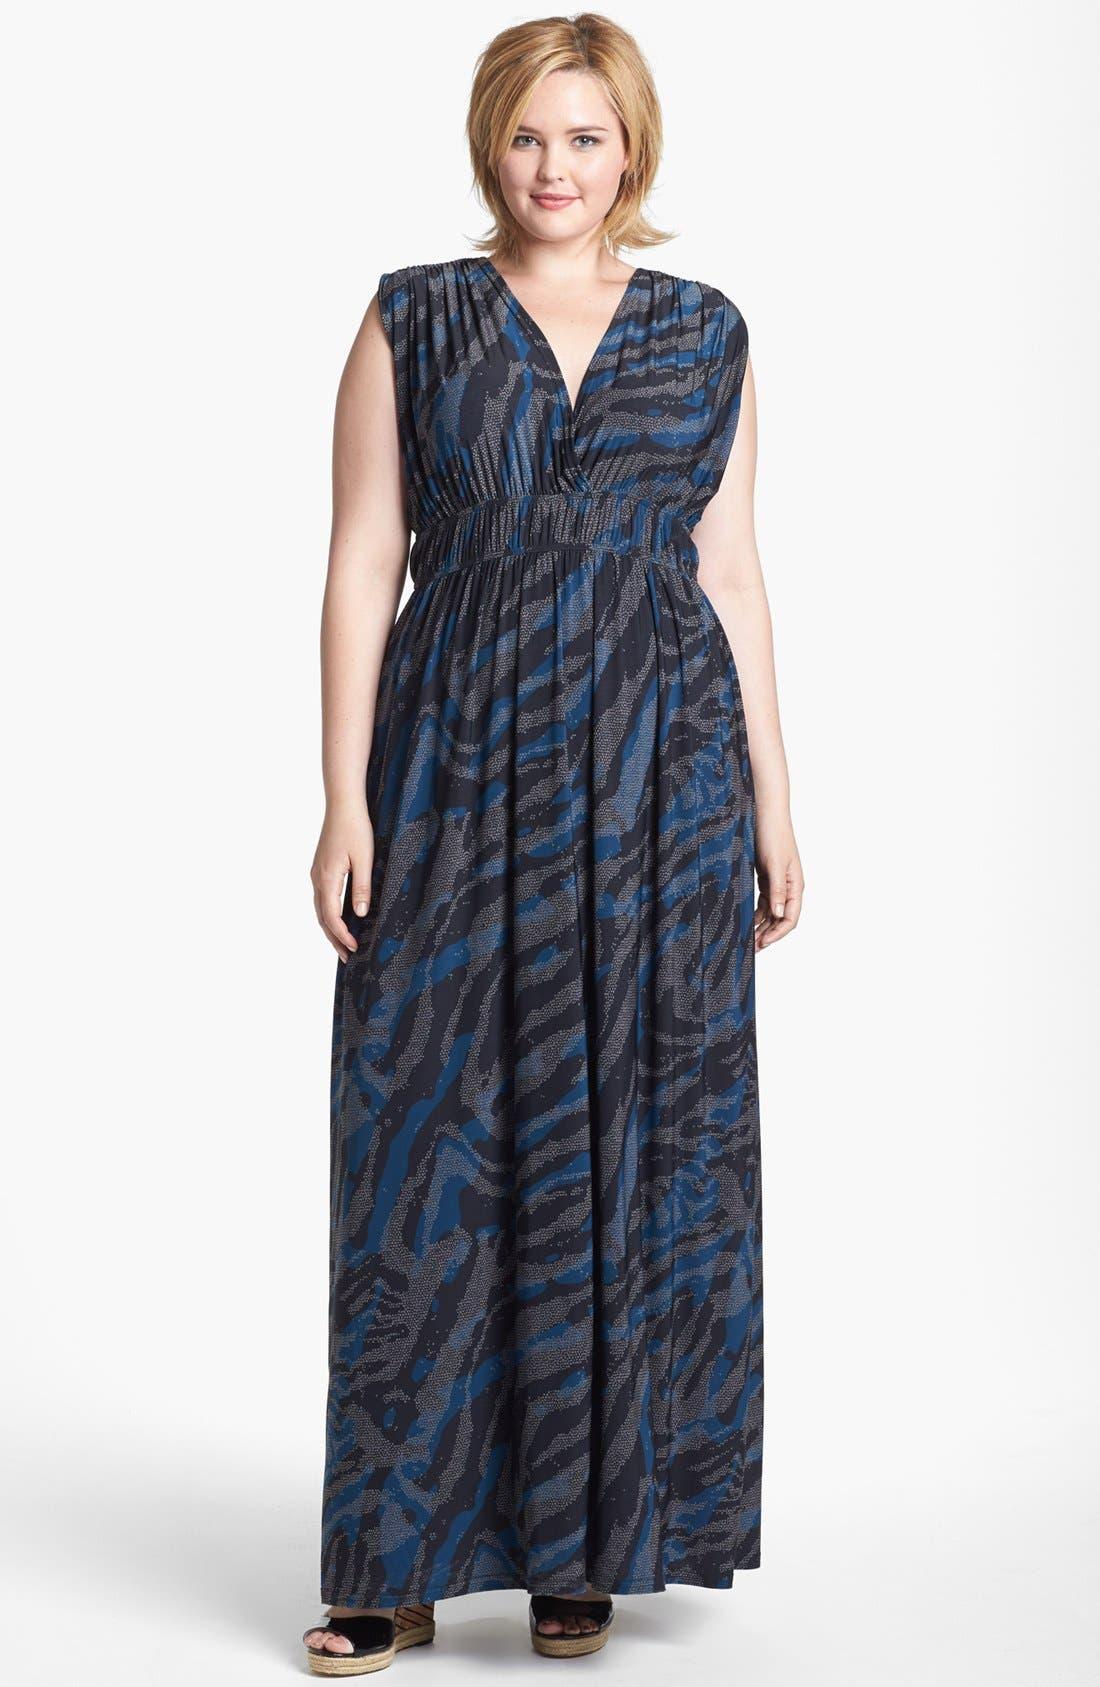 Alternate Image 1 Selected - Viereck 'Rochelle' Matte Jersey Maxi Dress (Plus Size)